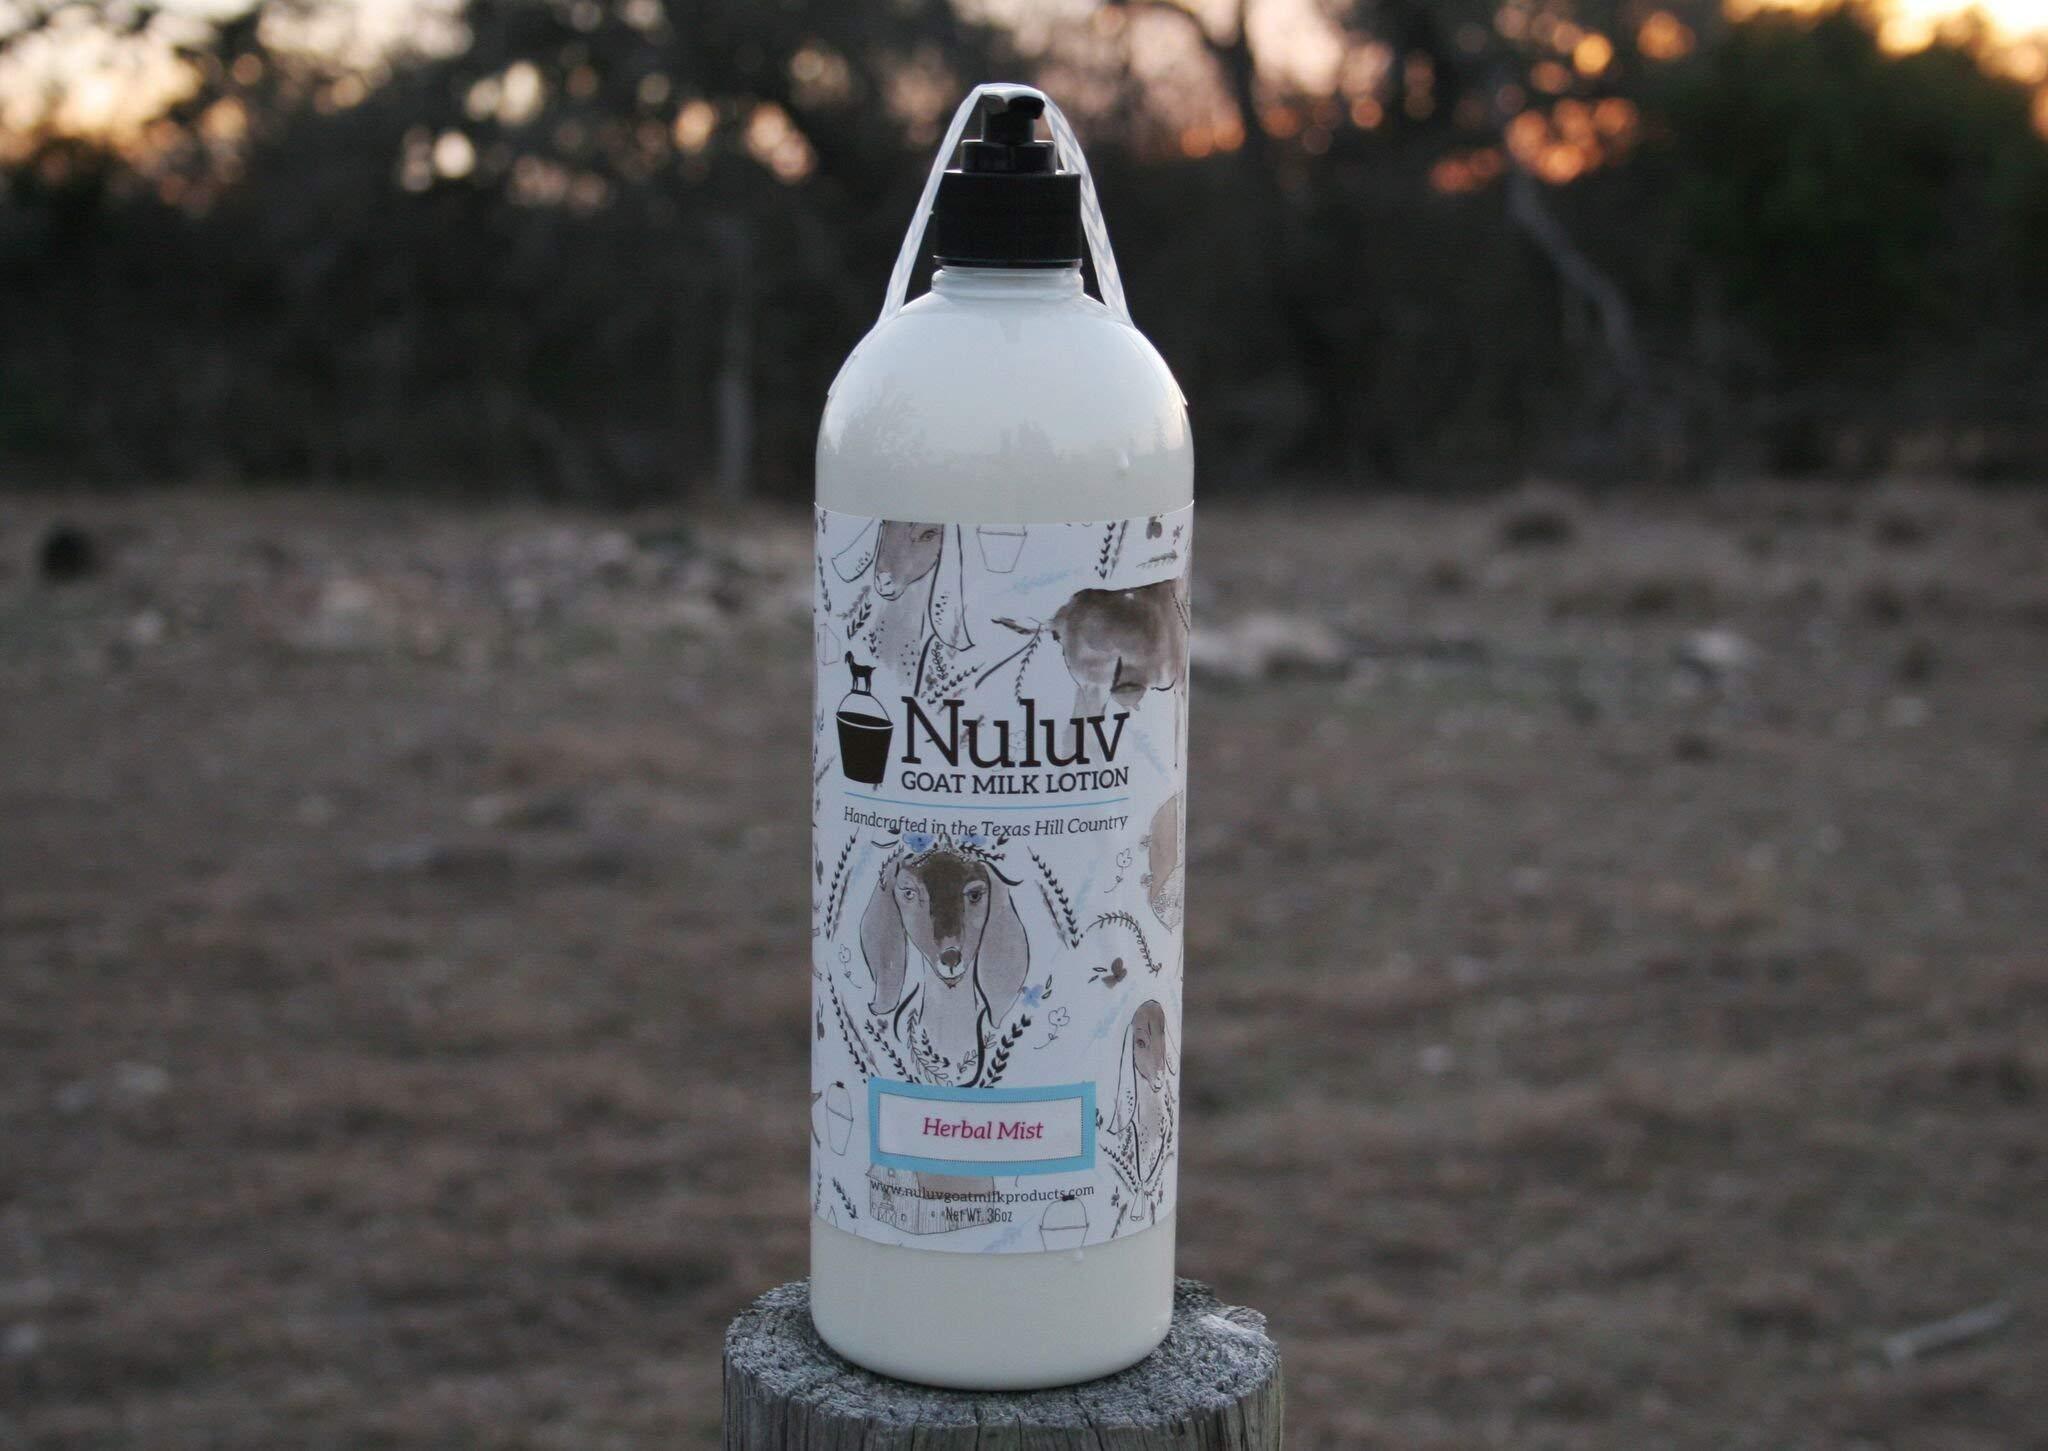 Family Size Goat Milk Lotion - goat's milk, goats milk, goatmilk